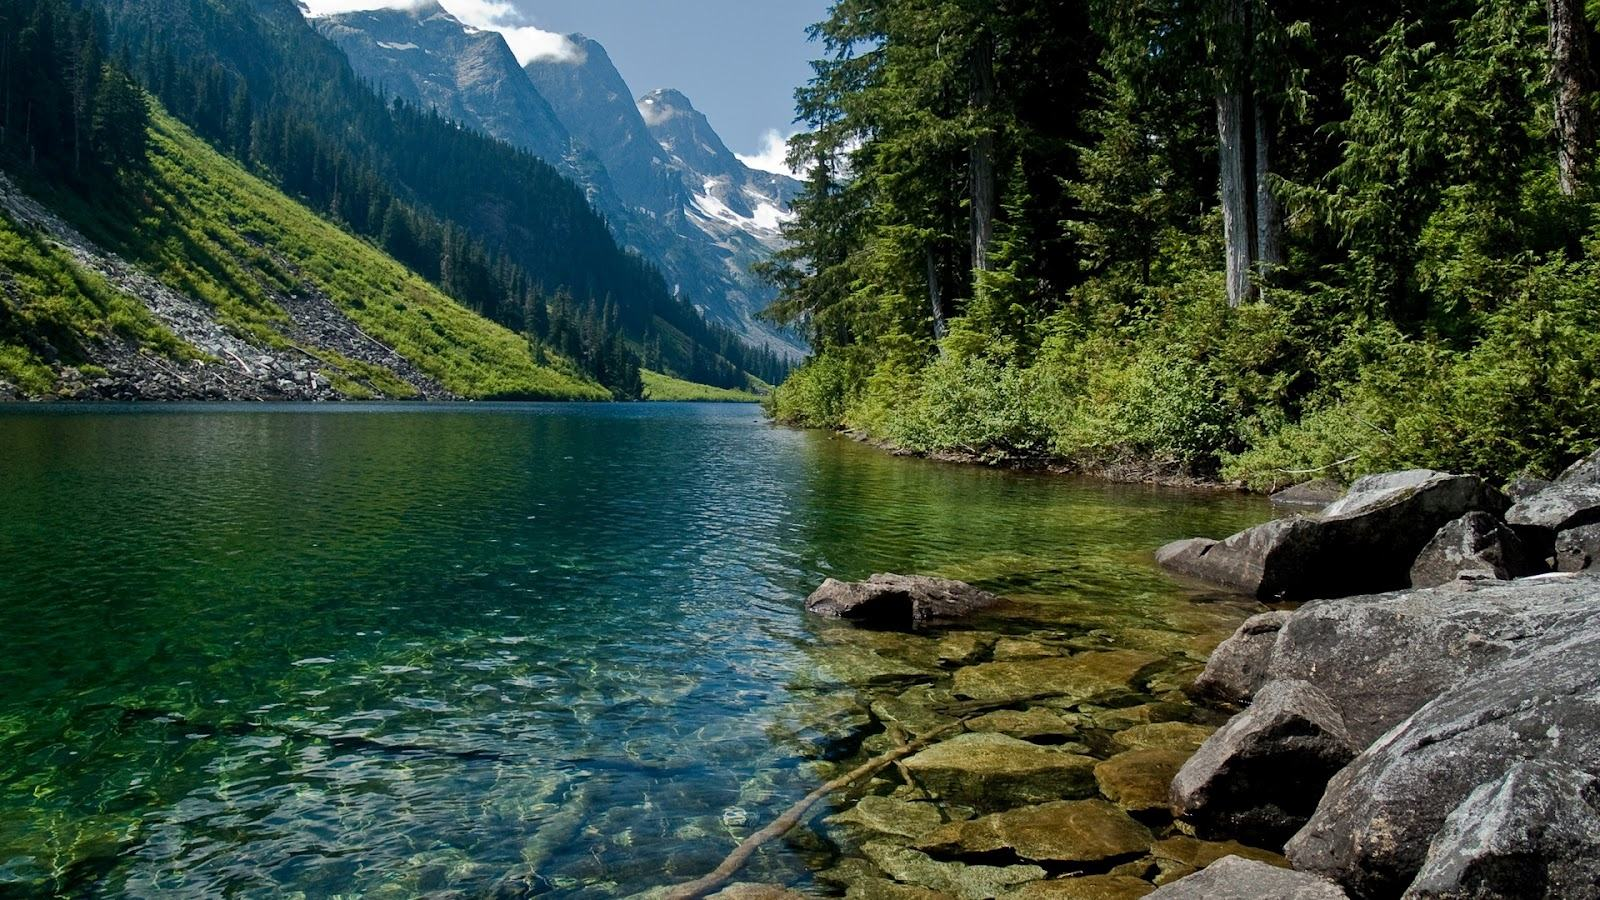 Cool Nature Wallpapers For Desktop Free Desktop 8 HD Wallpapers